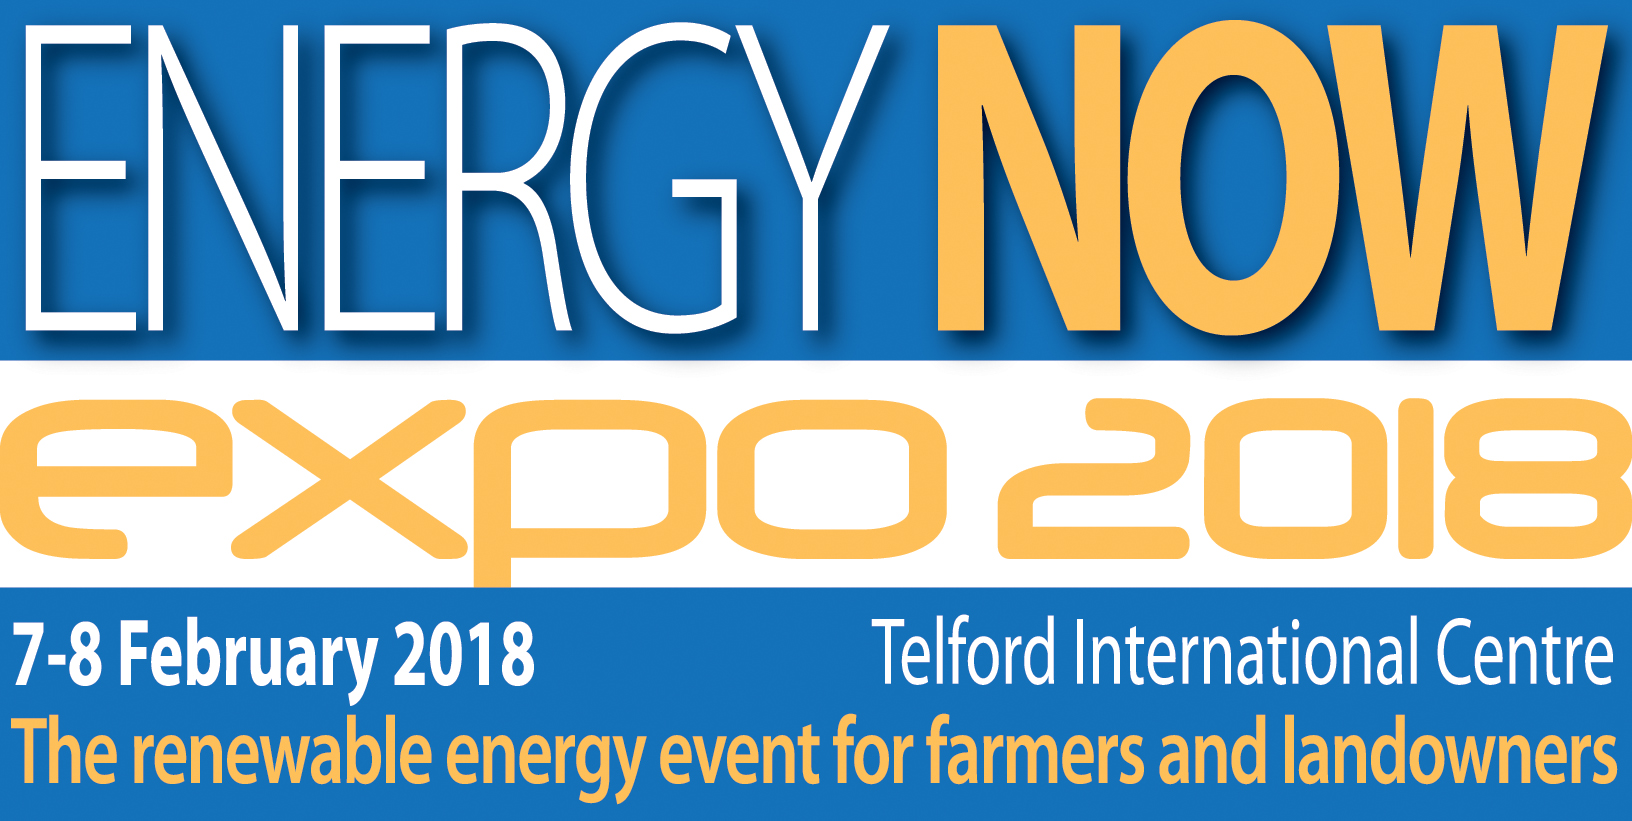 MEDIA PARTNER PRESS RELEASE: Energy Now Expo 2018